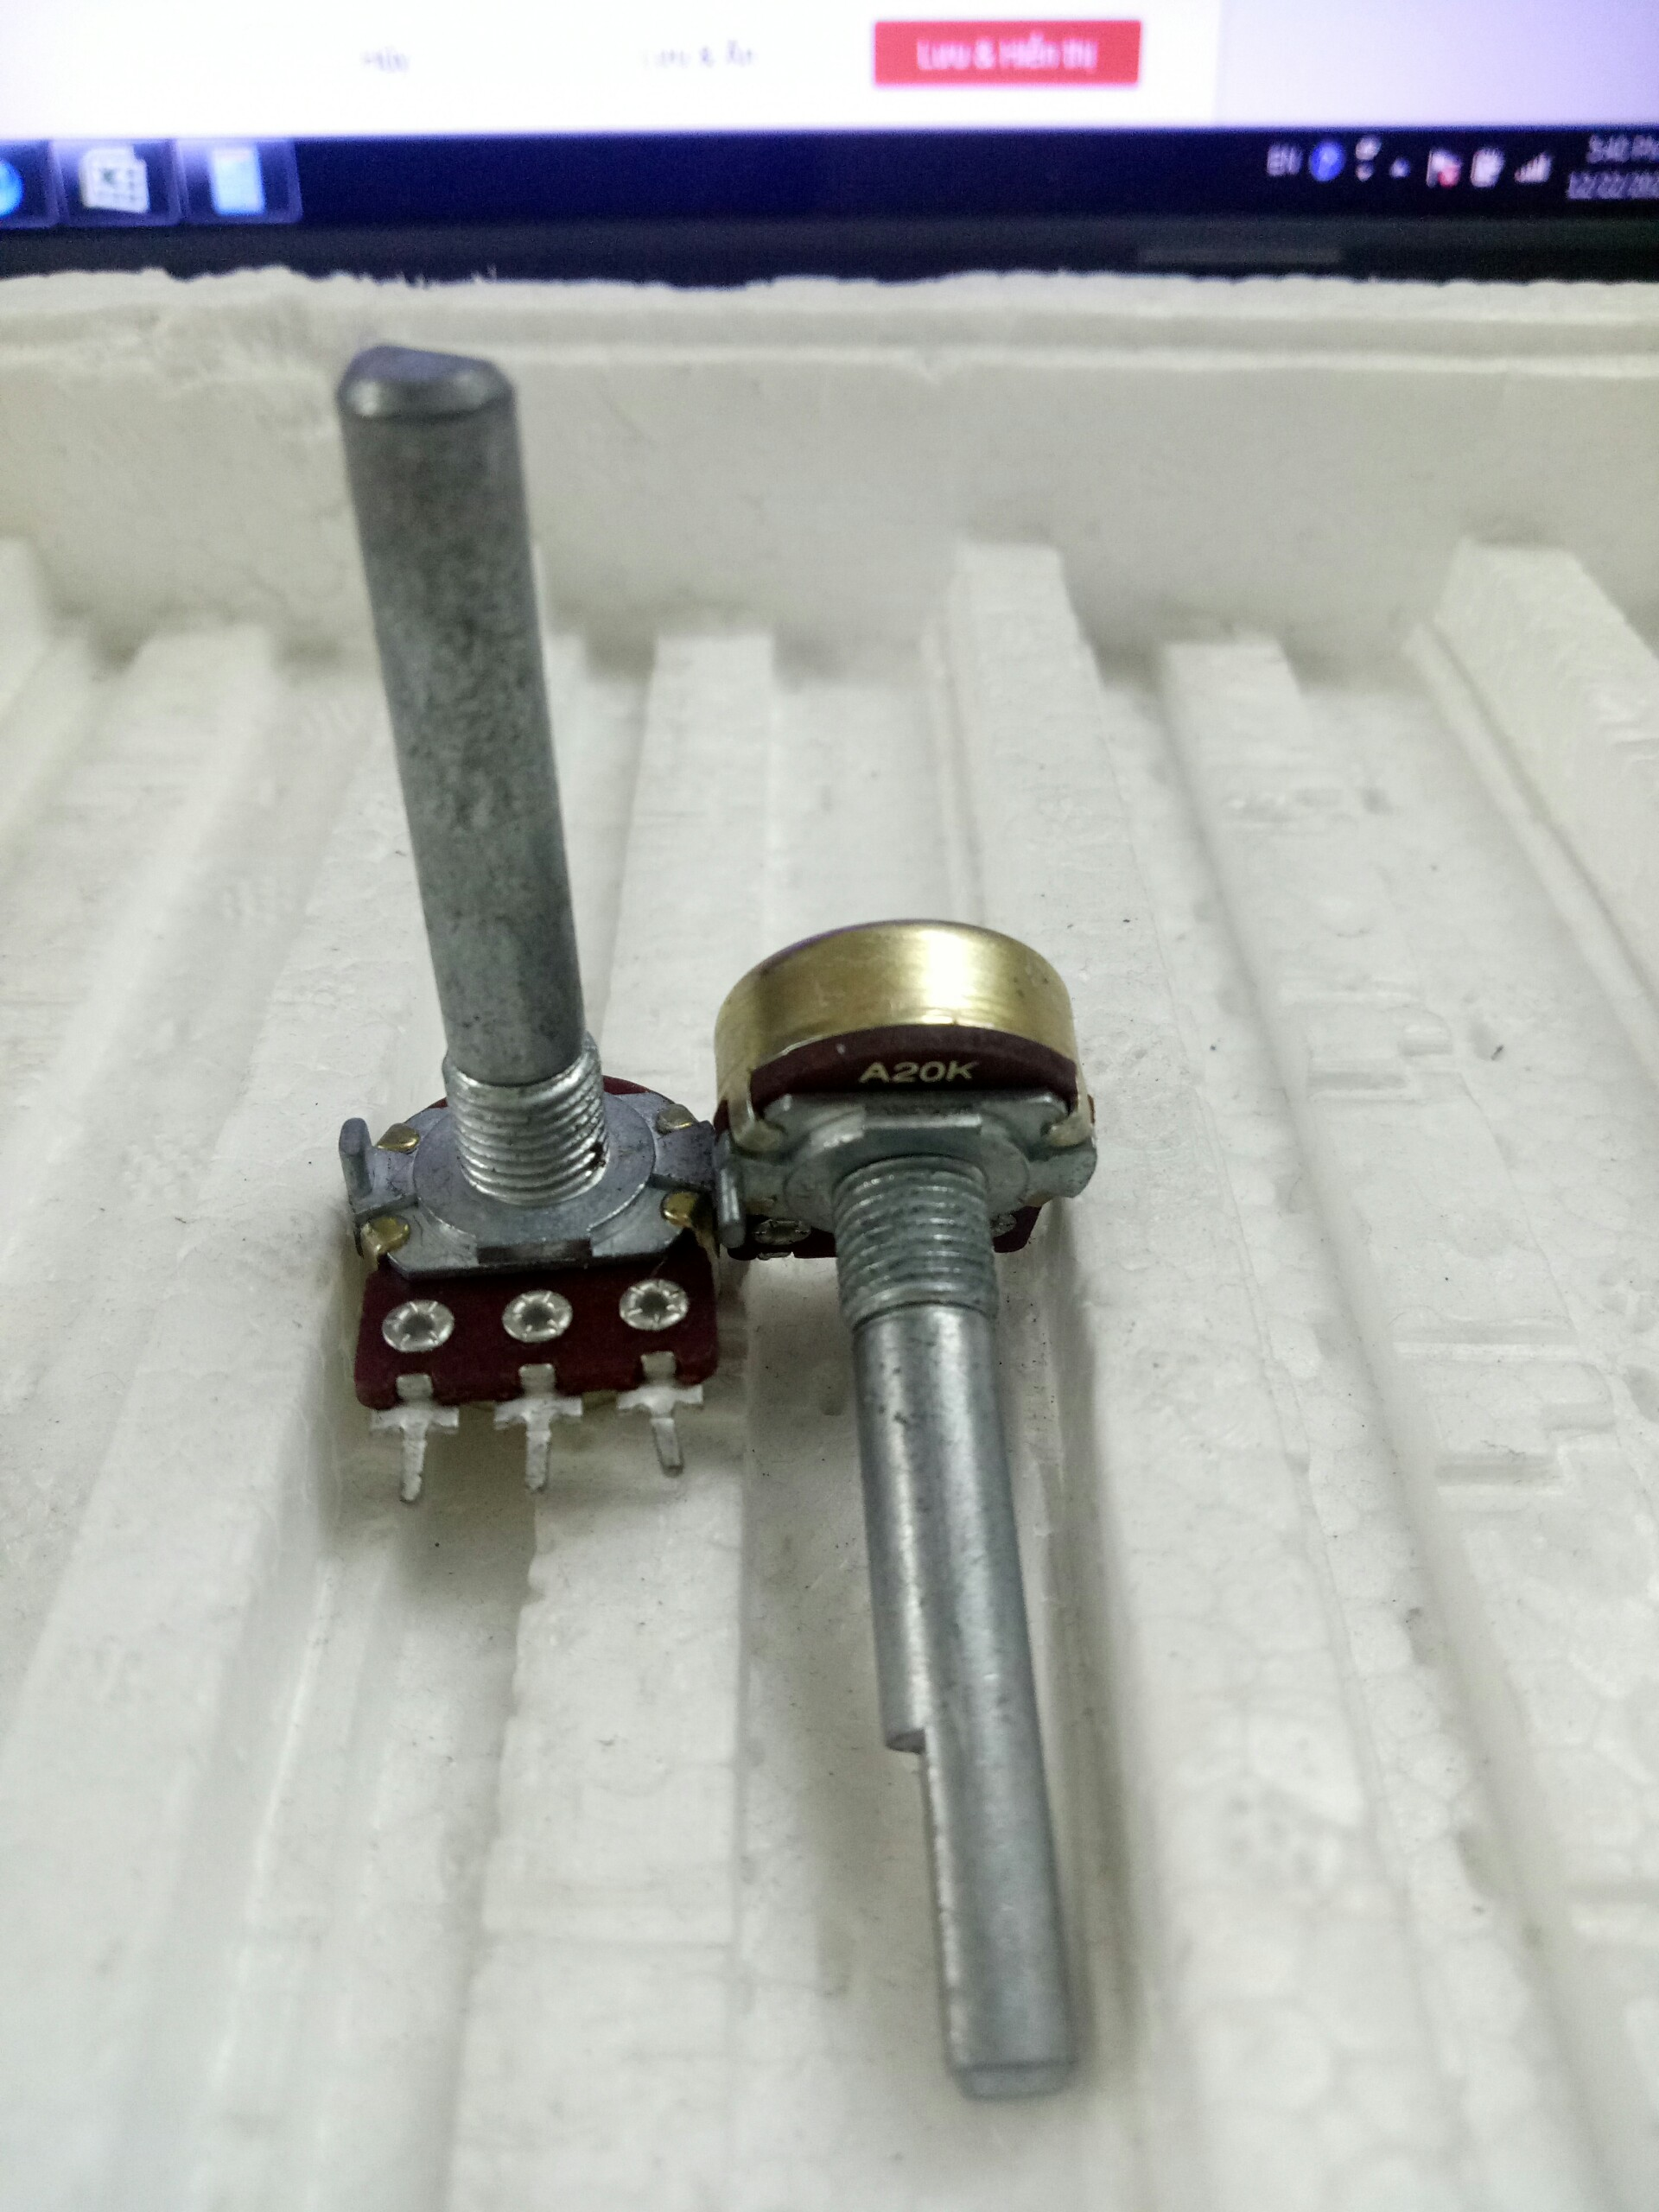 chiet-ap-don-alpha-a20k-dai-loan-can-vat-dai-30mm